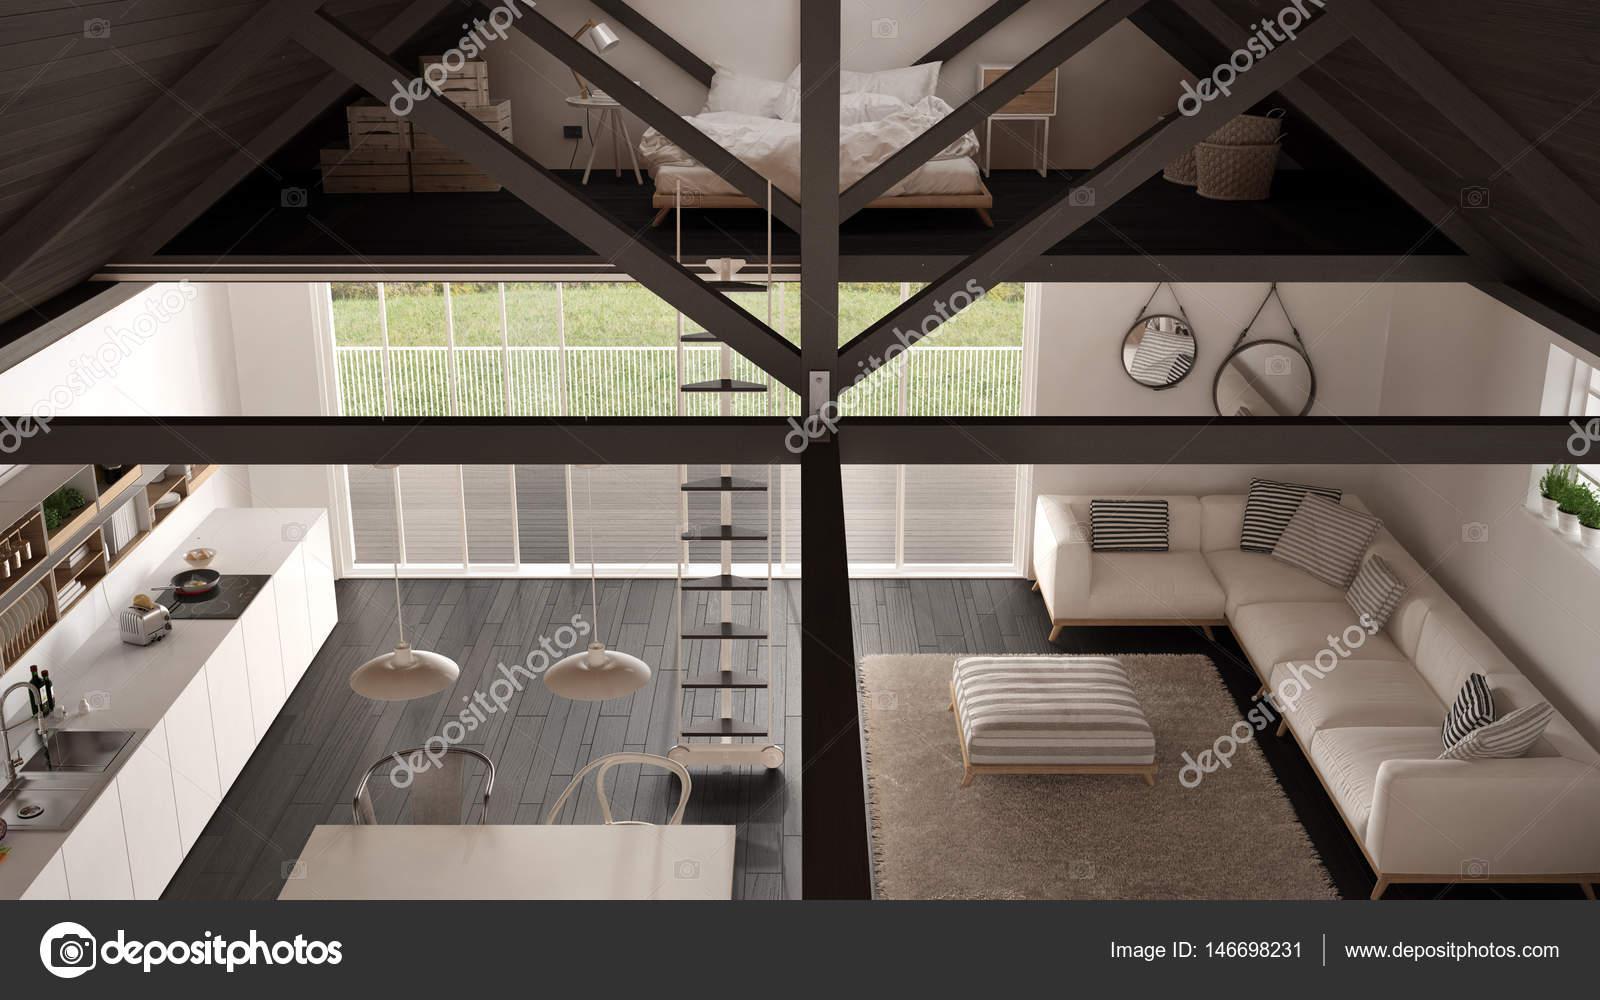 Minimalistisch interieur vlonder houten vlonders archieven huis